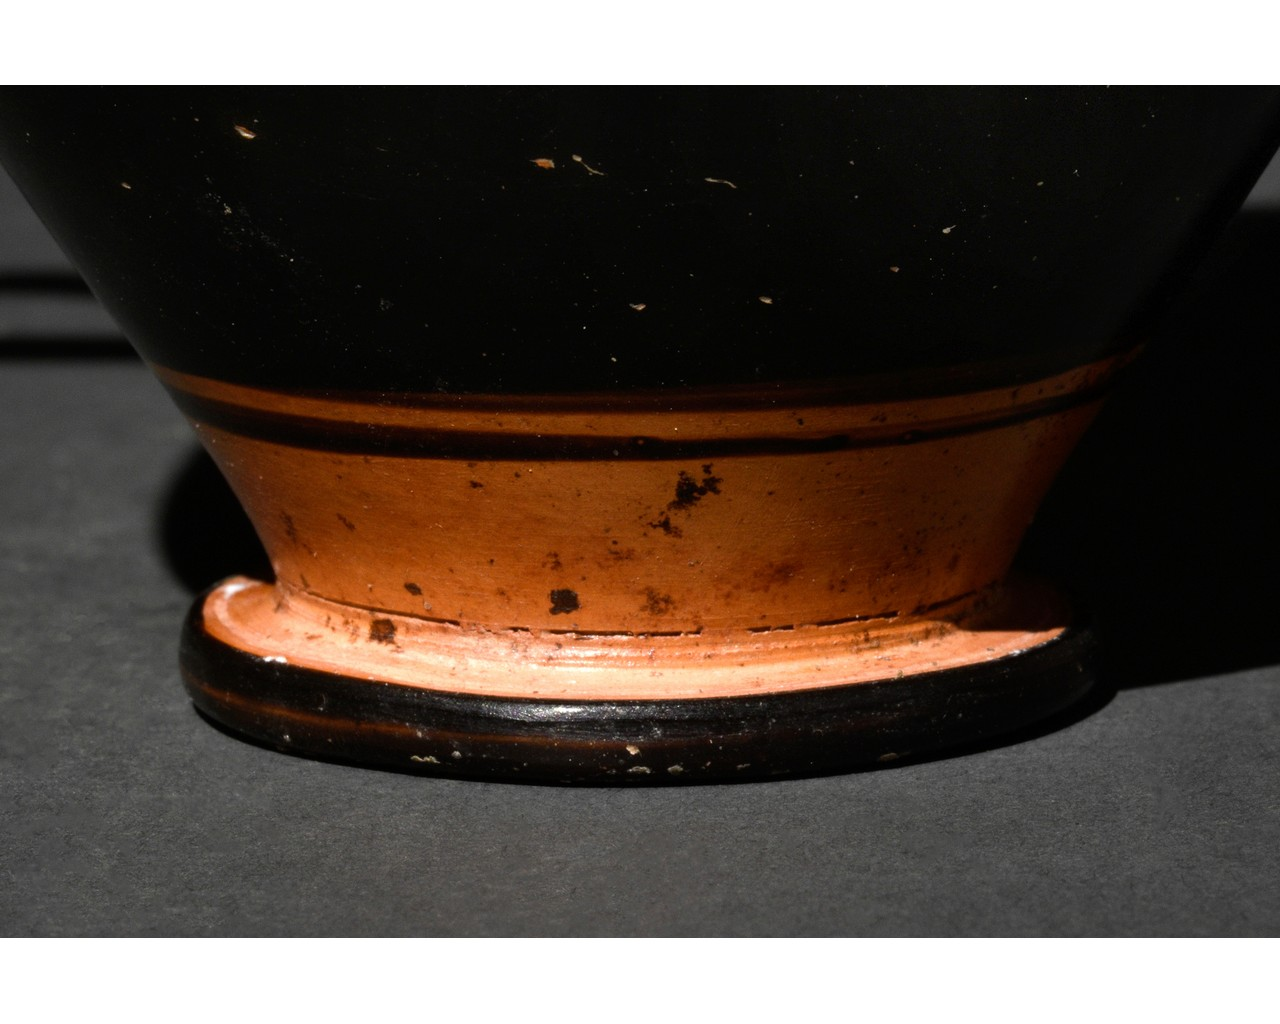 GREEK APULIAN BLACK-GLAZED POTTERY SKYPHOS - Image 6 of 6